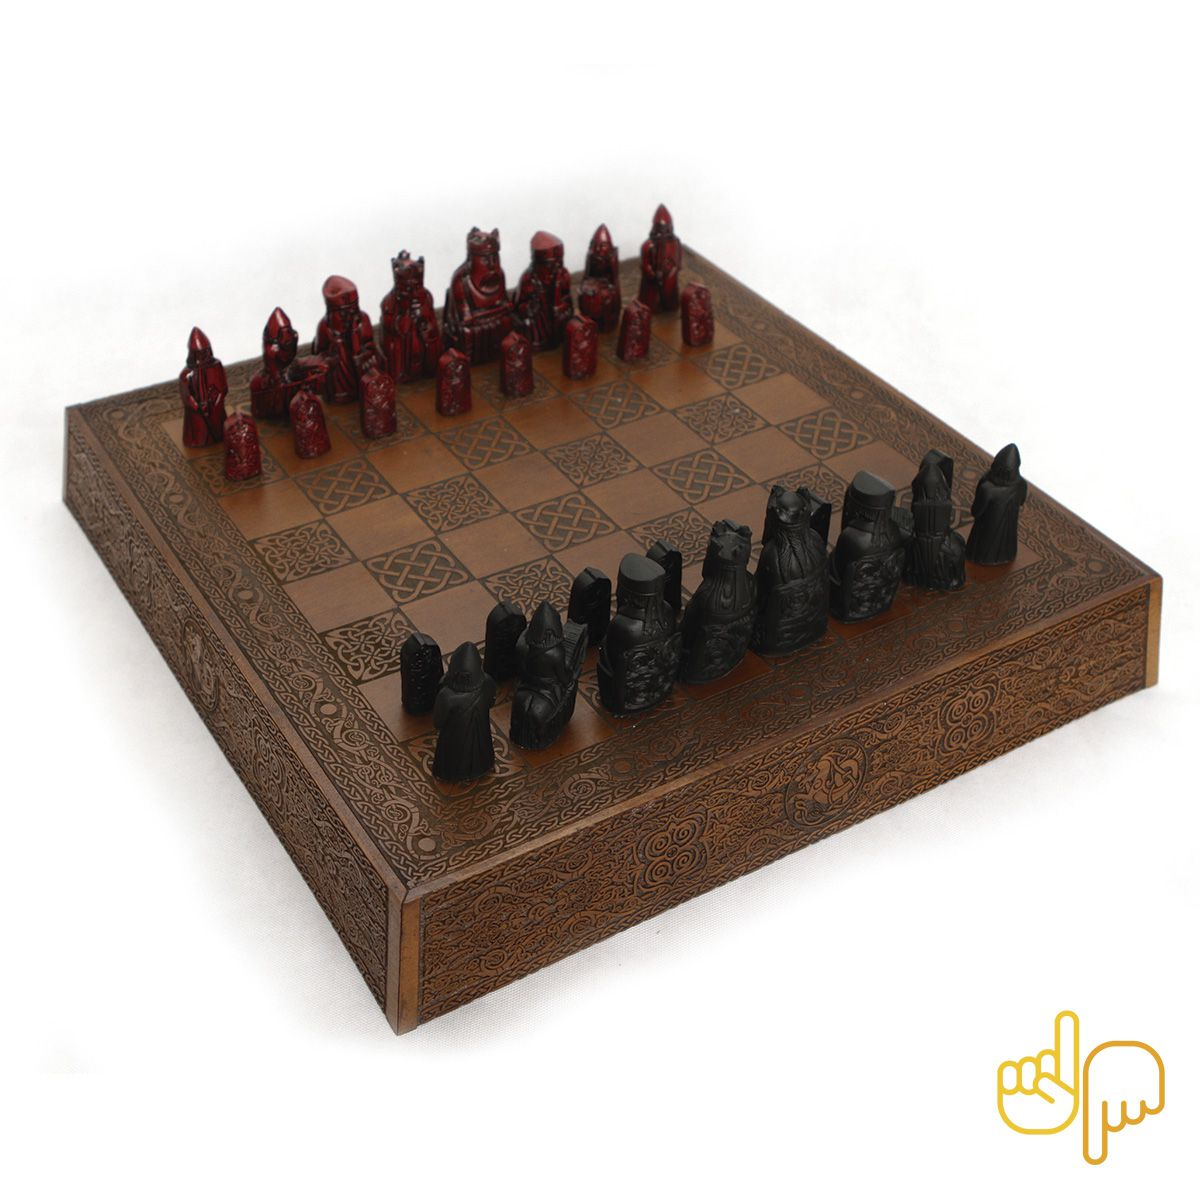 Tabuleiro de Xadrez Luxo Versão Exclusiva Lewis 32 peças